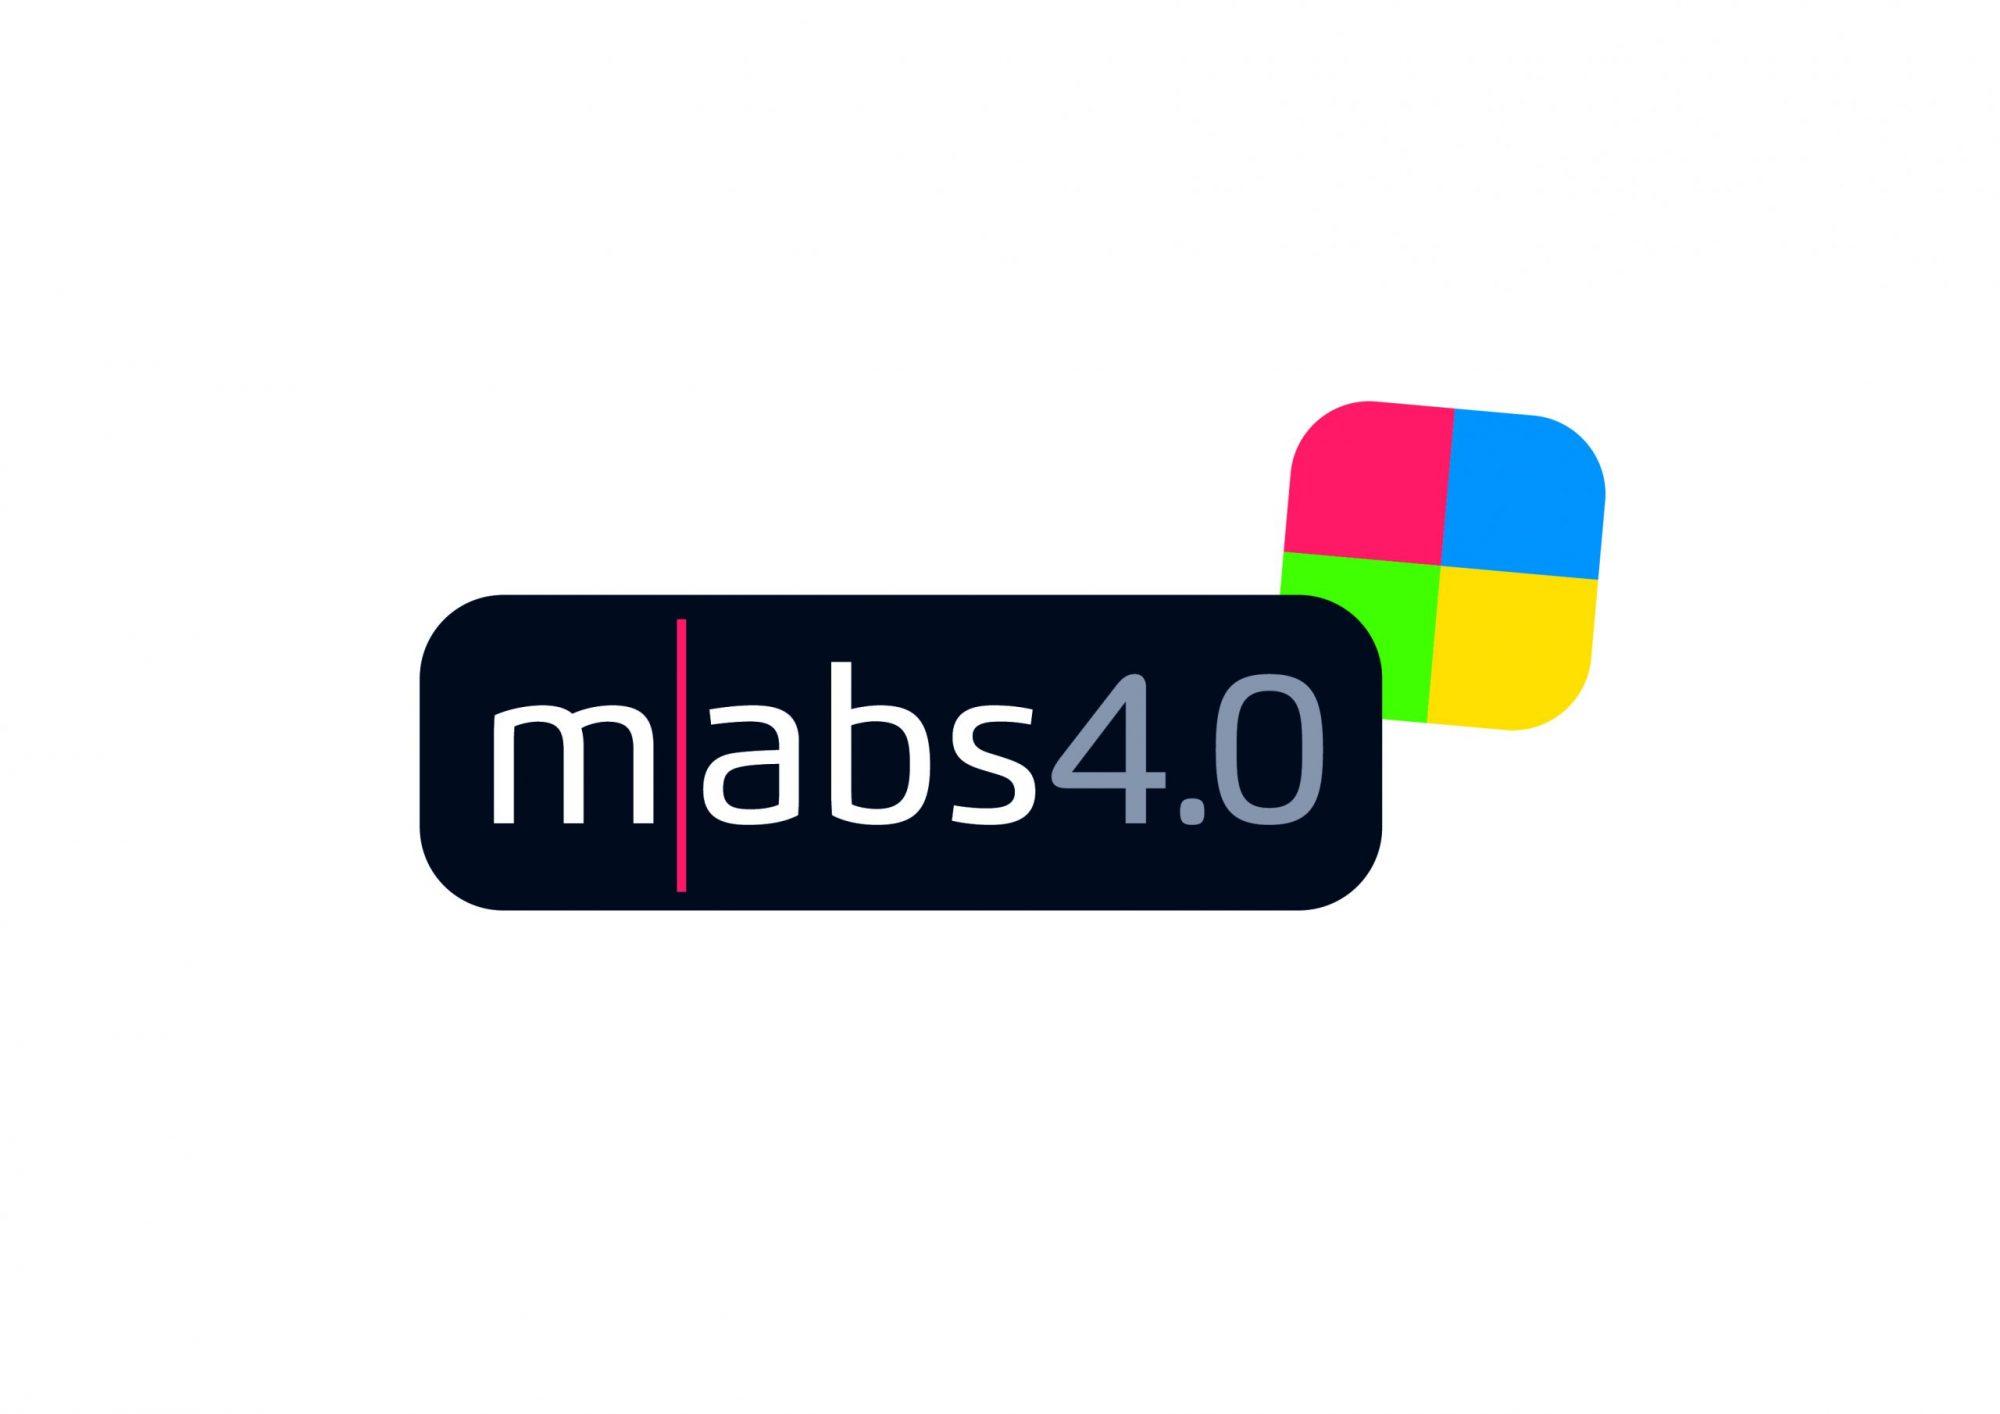 mabs-nl